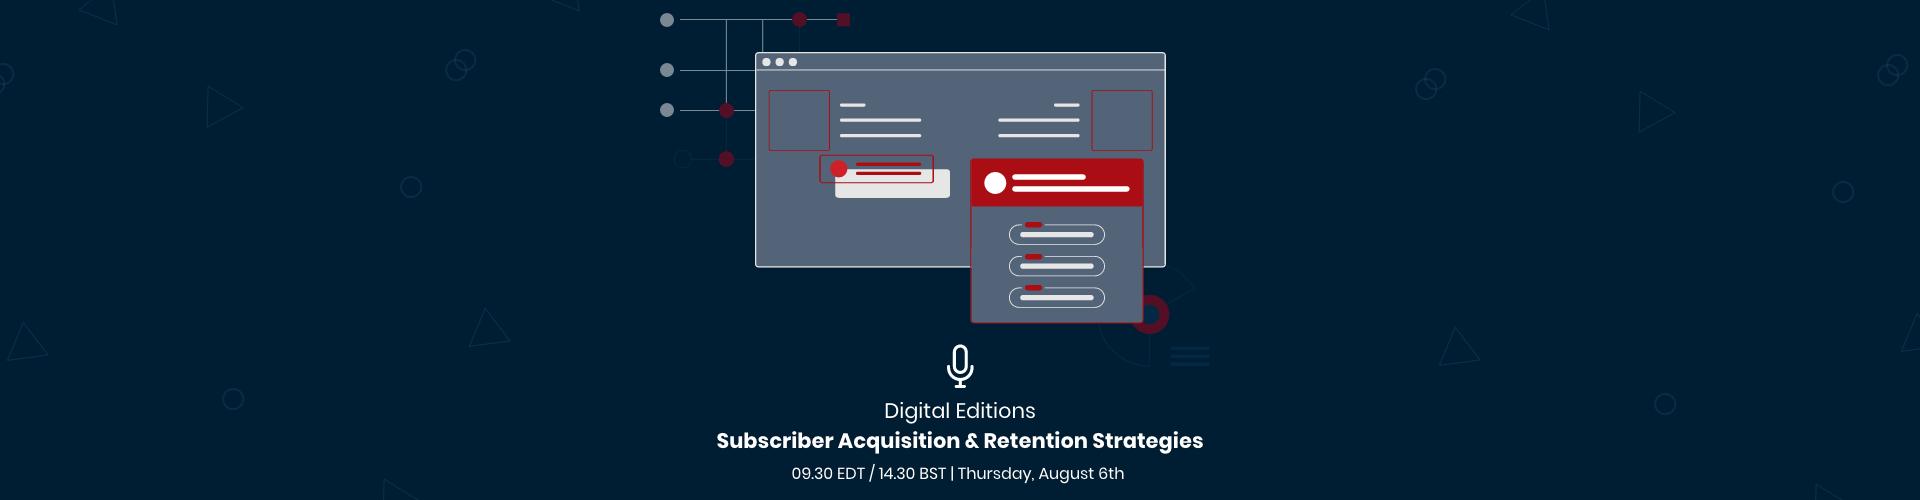 Webinar: Digital Editions: Subscriber Acquisition & Retention Strategies